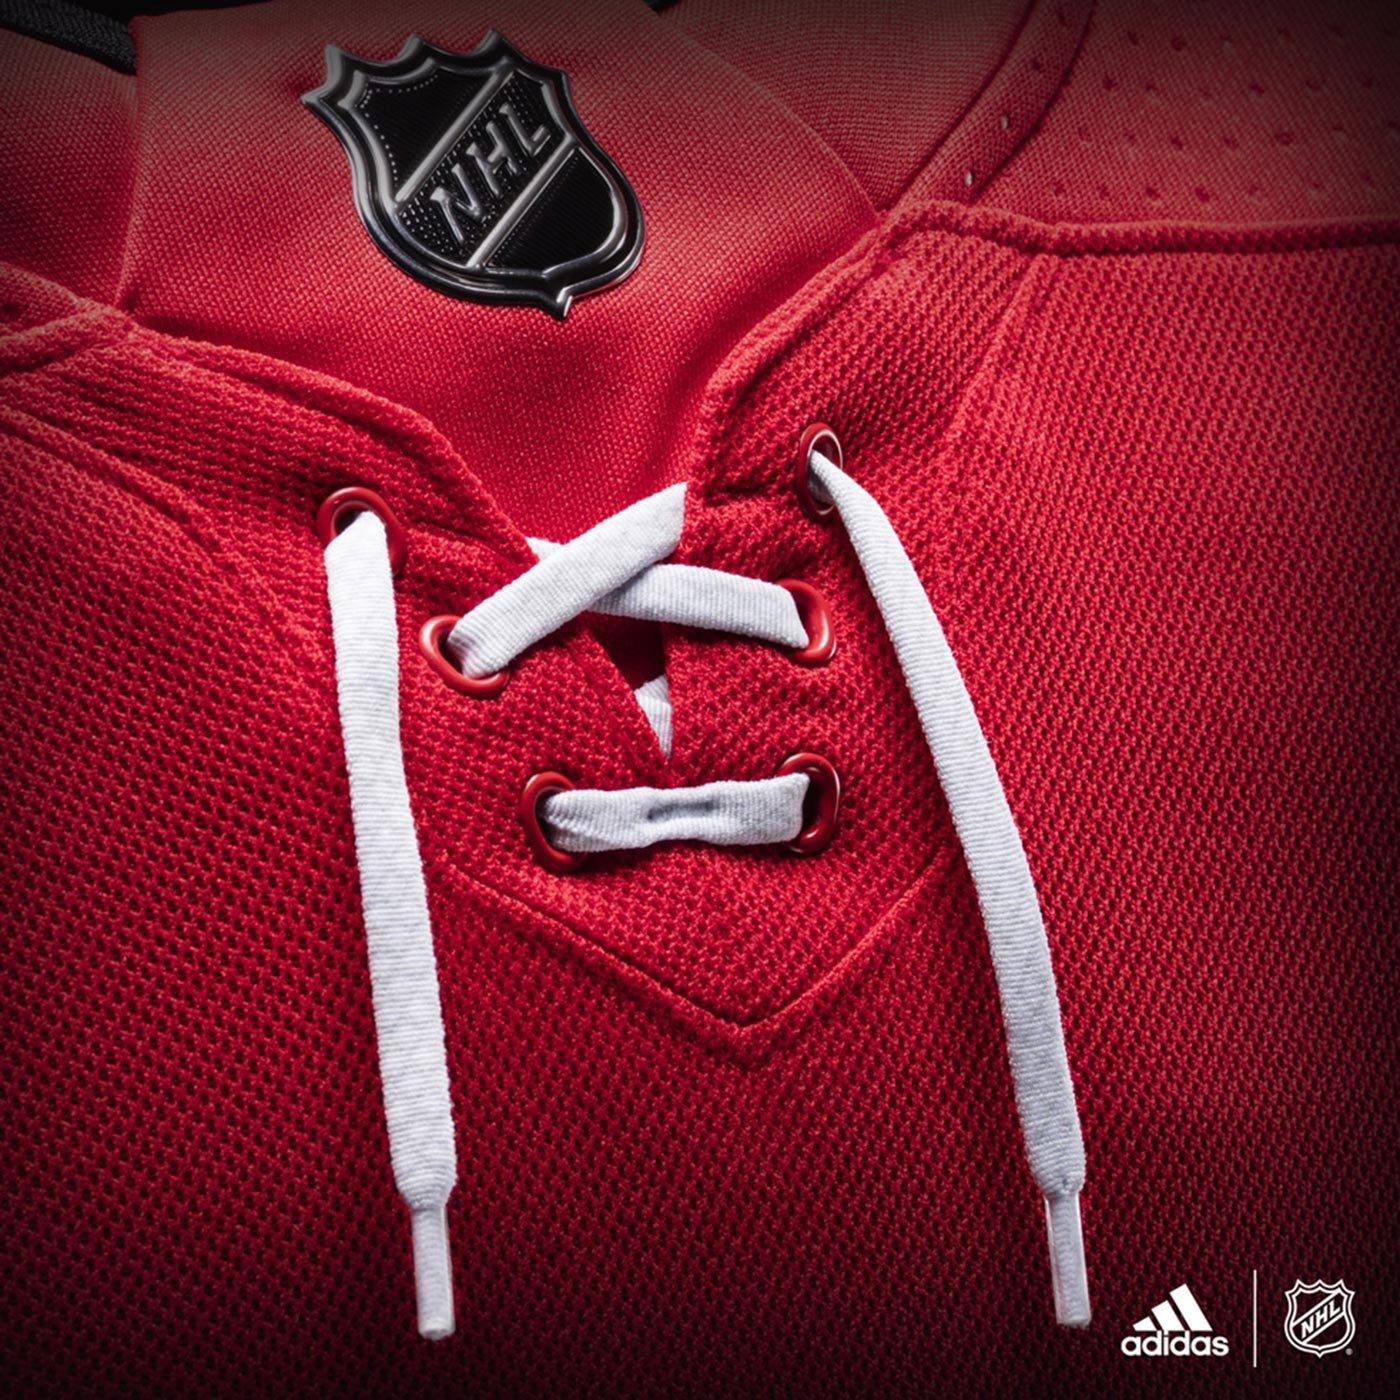 9f385339ee2db adidas Carolina Hurricanes NHL Men's Climalite Authentic Team Hockey Jersey